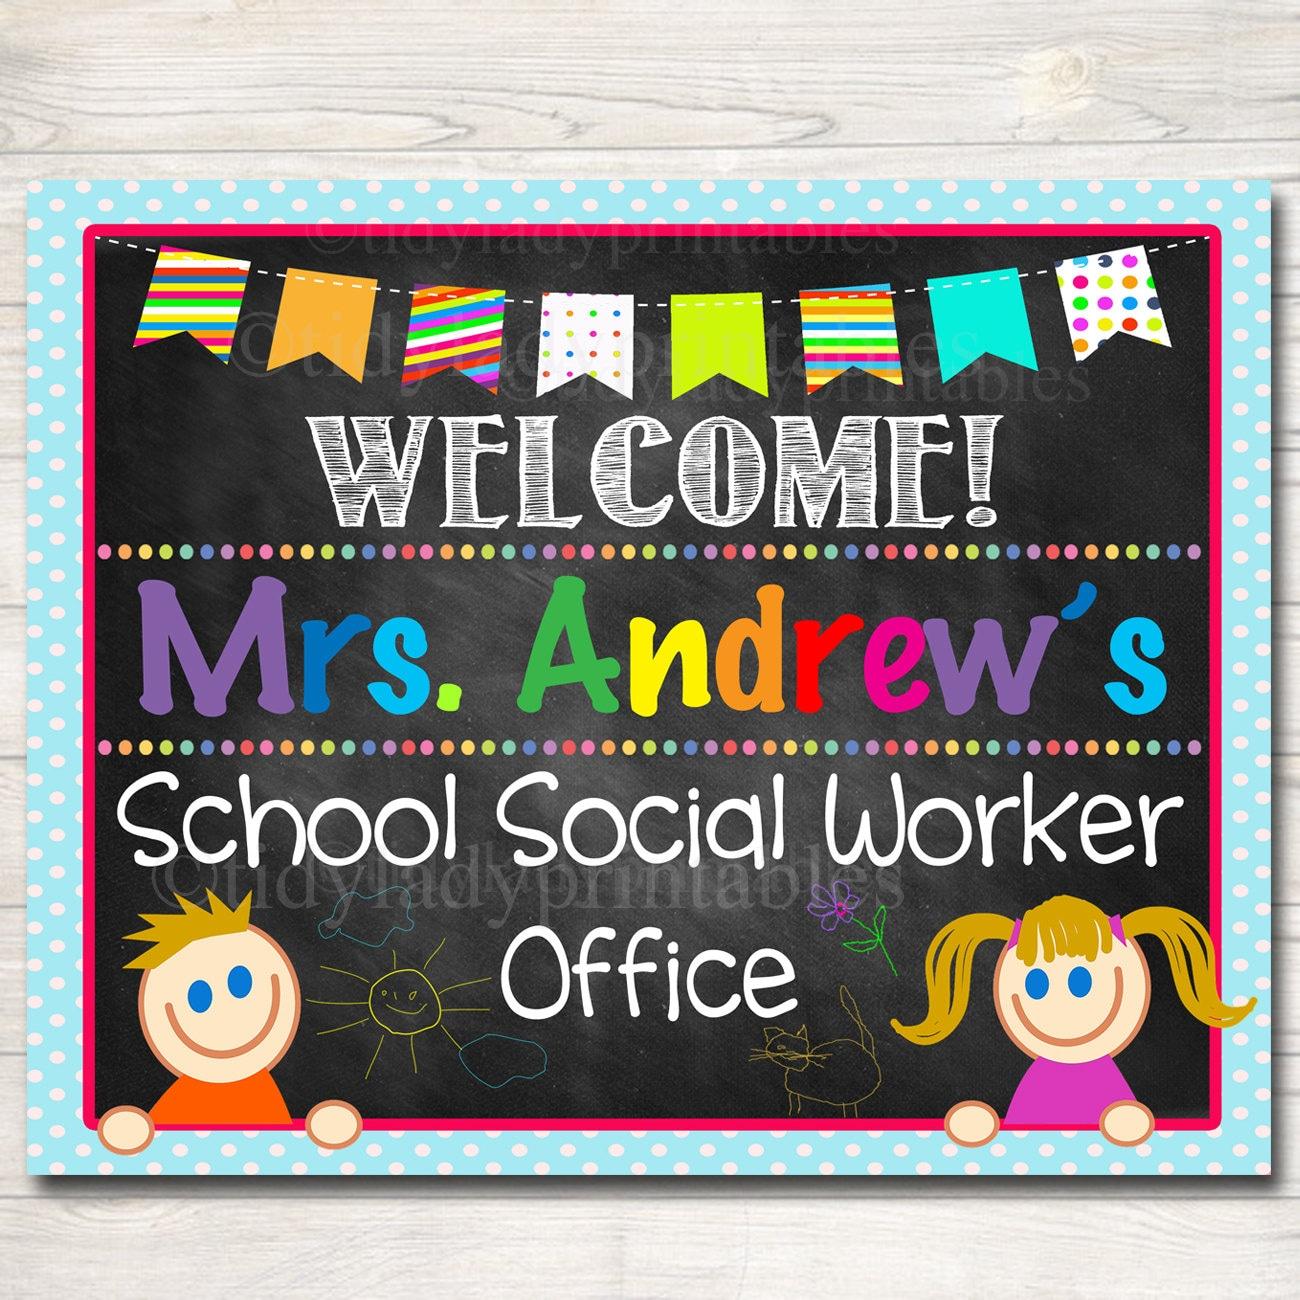 Scrapbook ideas for elderly - Custom Social Worker Door Sign Personalized Social Worker Office Sign School Office Door Decor Social Worker Gifts School Social Worker